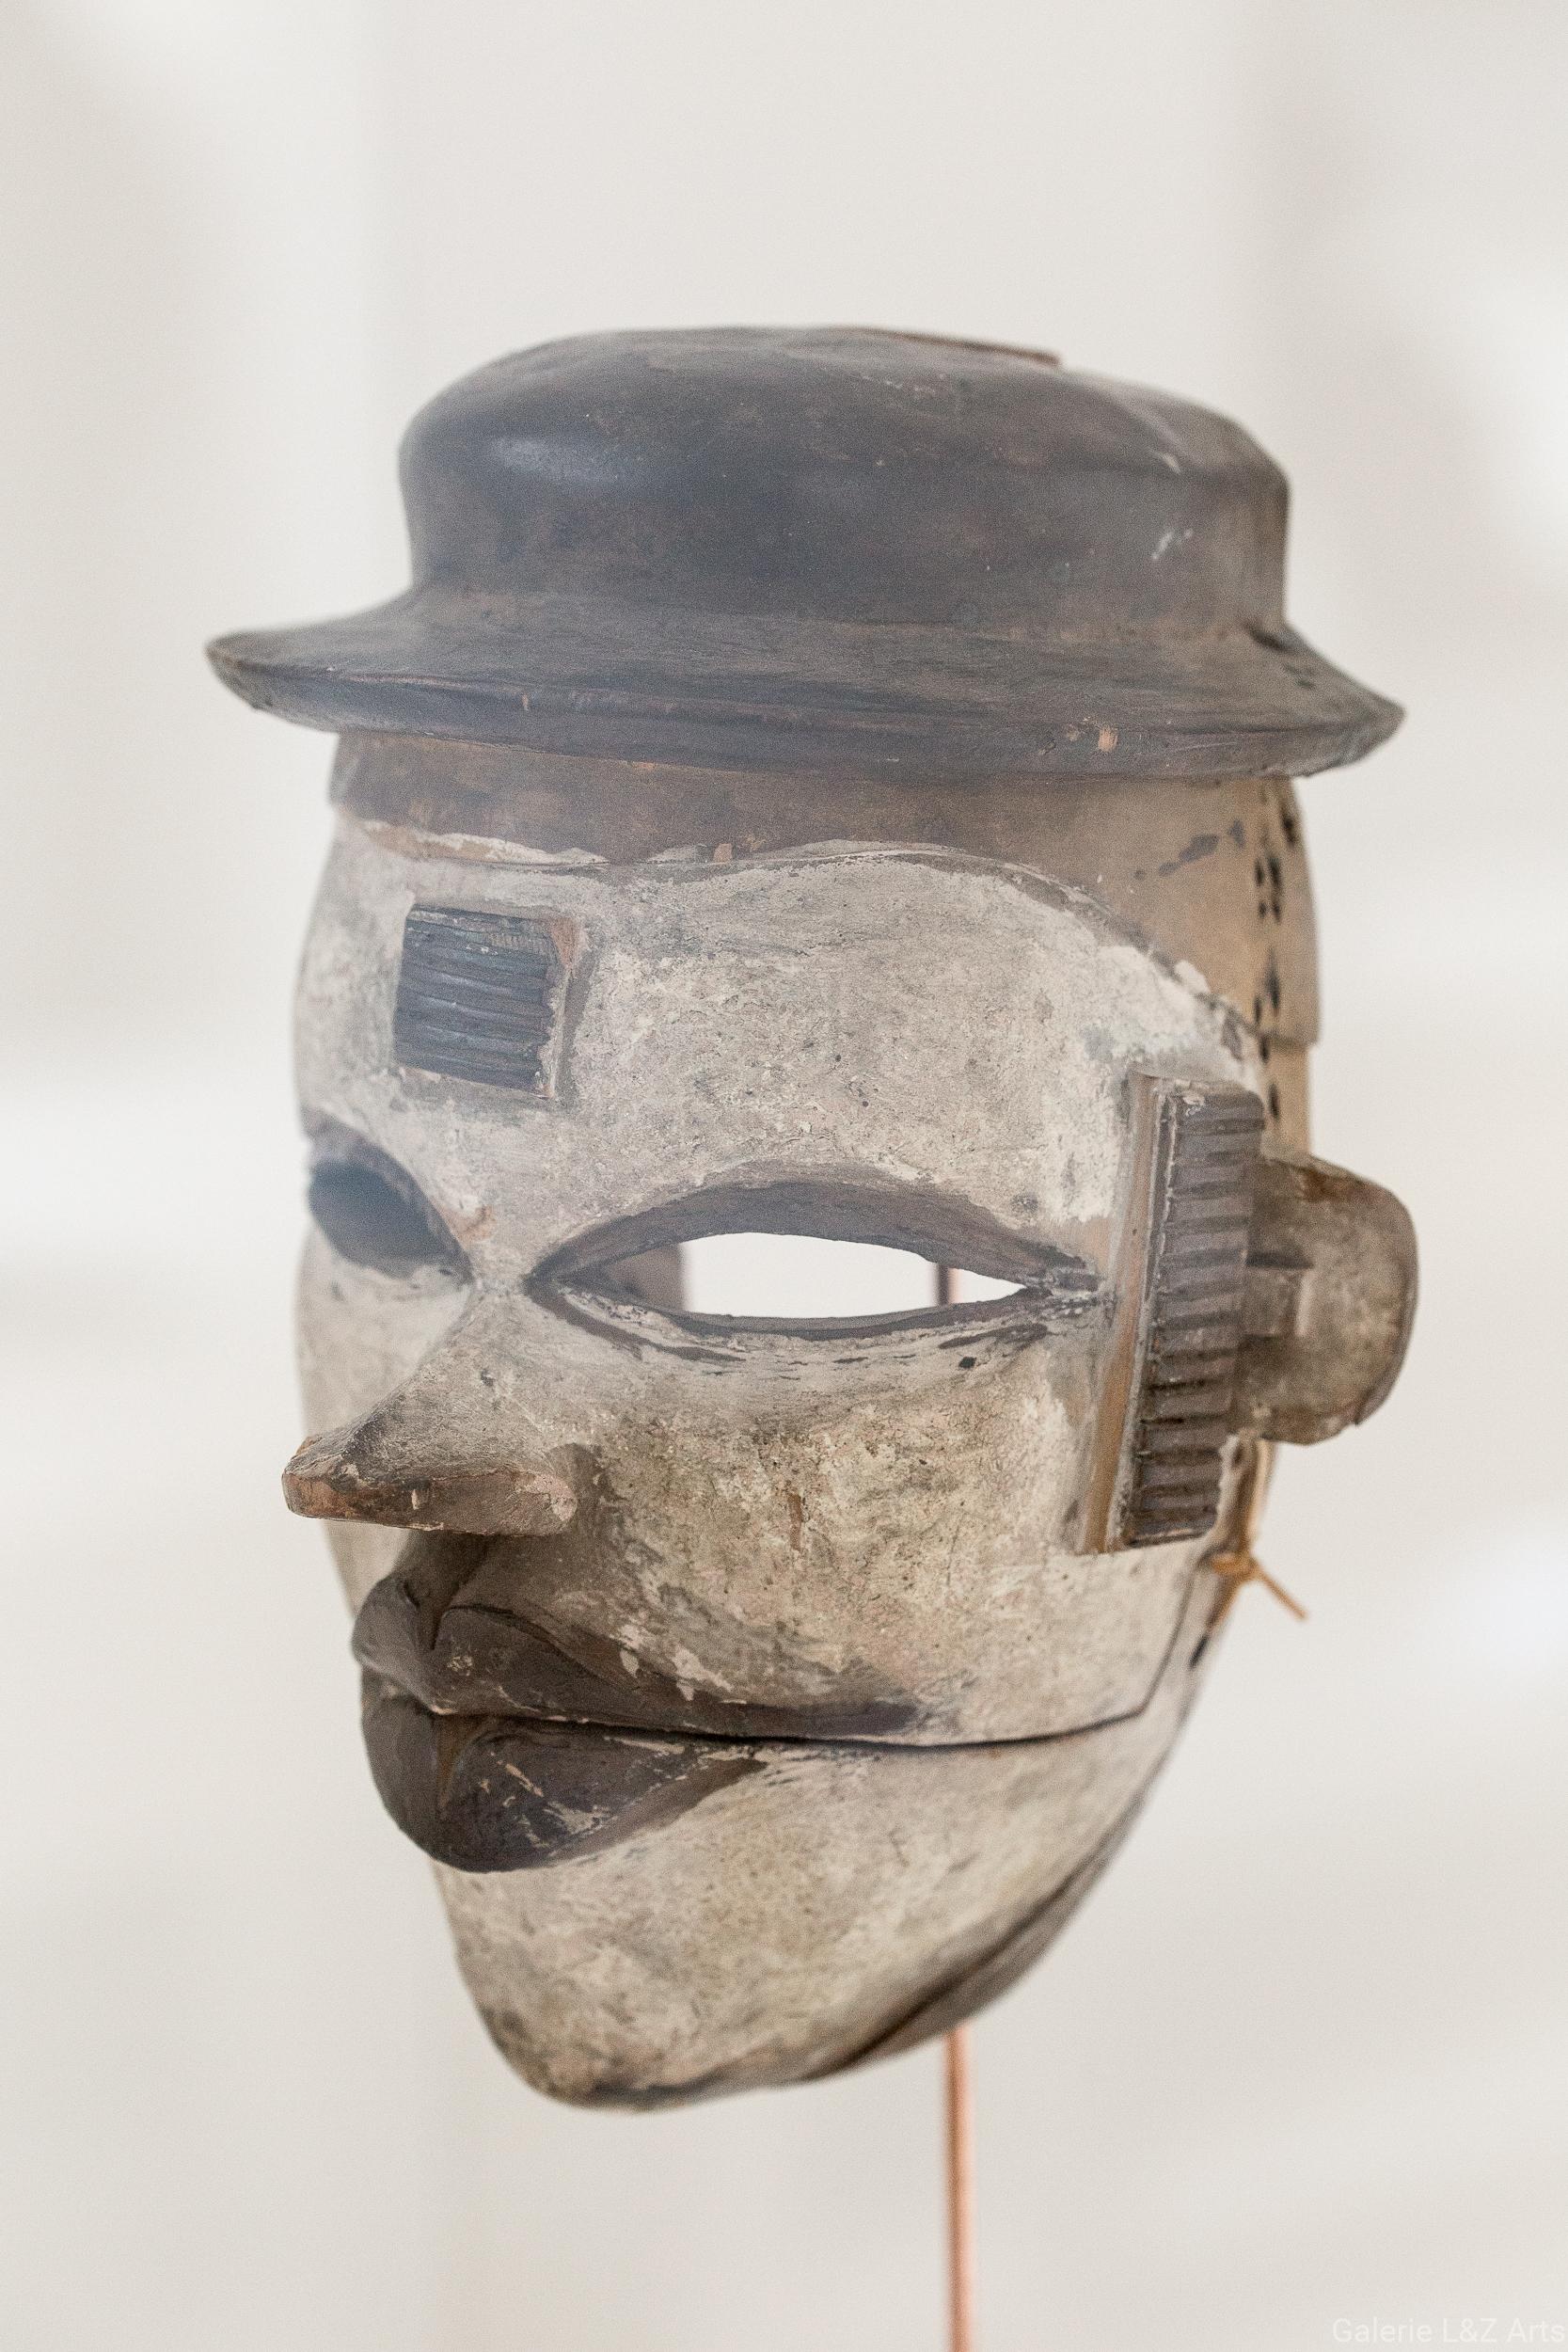 tribal-art-oostende-ostende-exposition-galerie-lz-art-africain-belgique-7.jpg